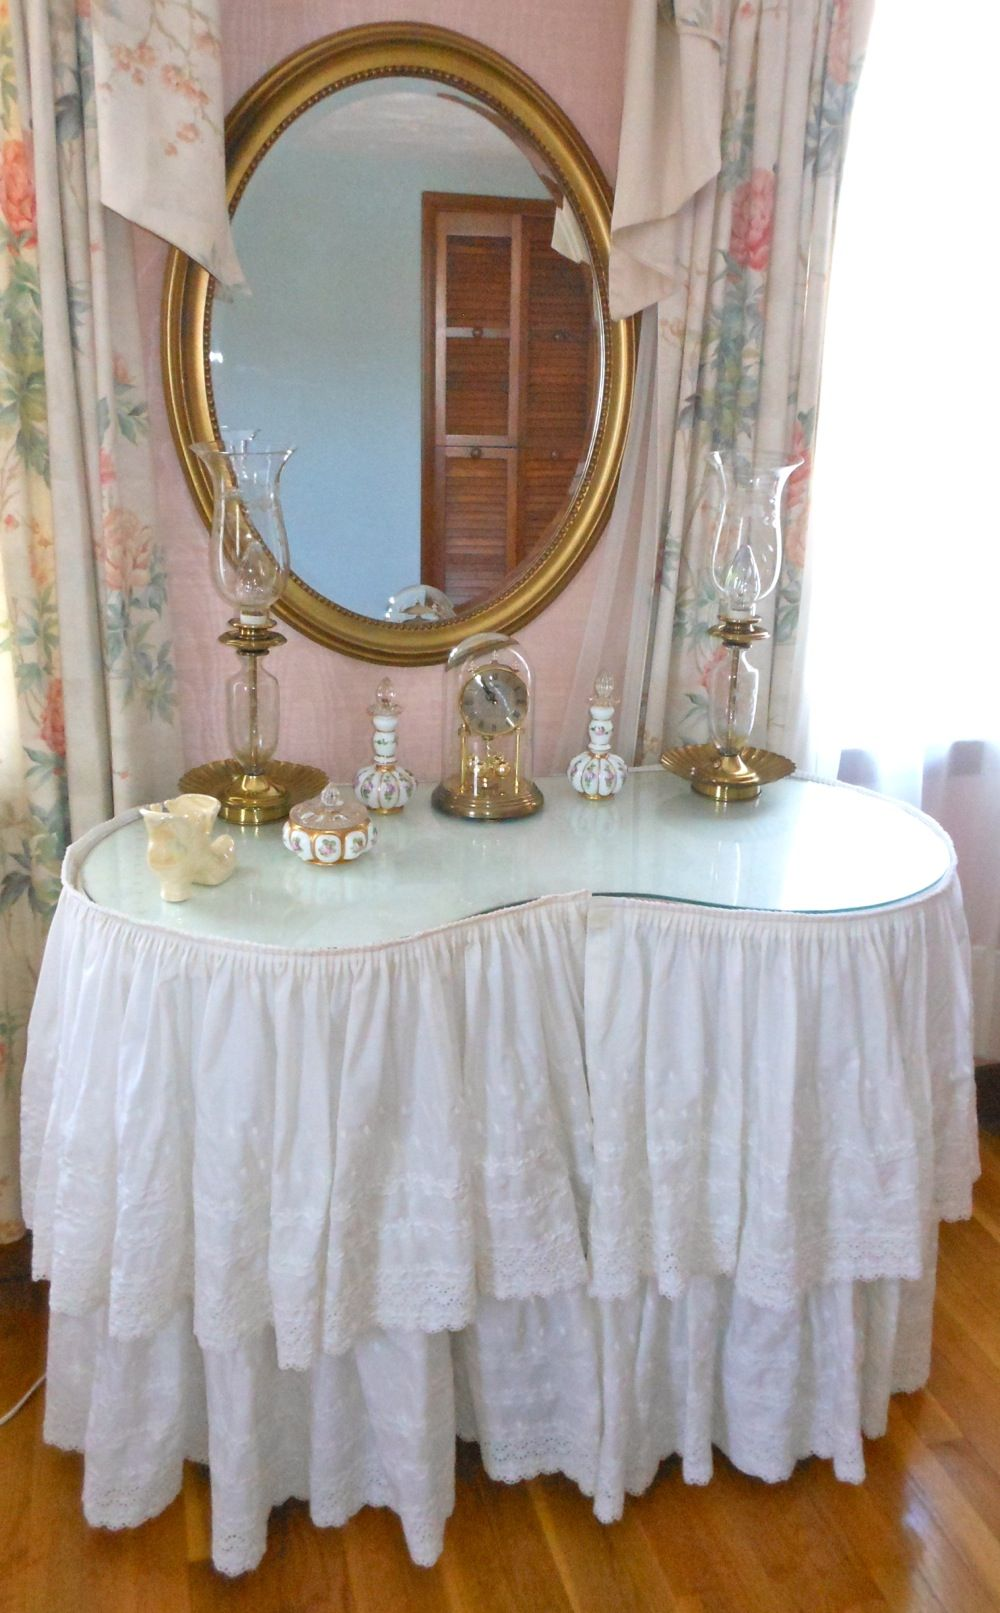 Kidney Shaped Vanity Skirts For Sale : kidney, shaped, vanity, skirts, Kidney, Shaped, Table, White, Eyelet, Skirt, Beautiful, Mirror., Mirror, Bedroom,, Wall,, Shabby, Dresser